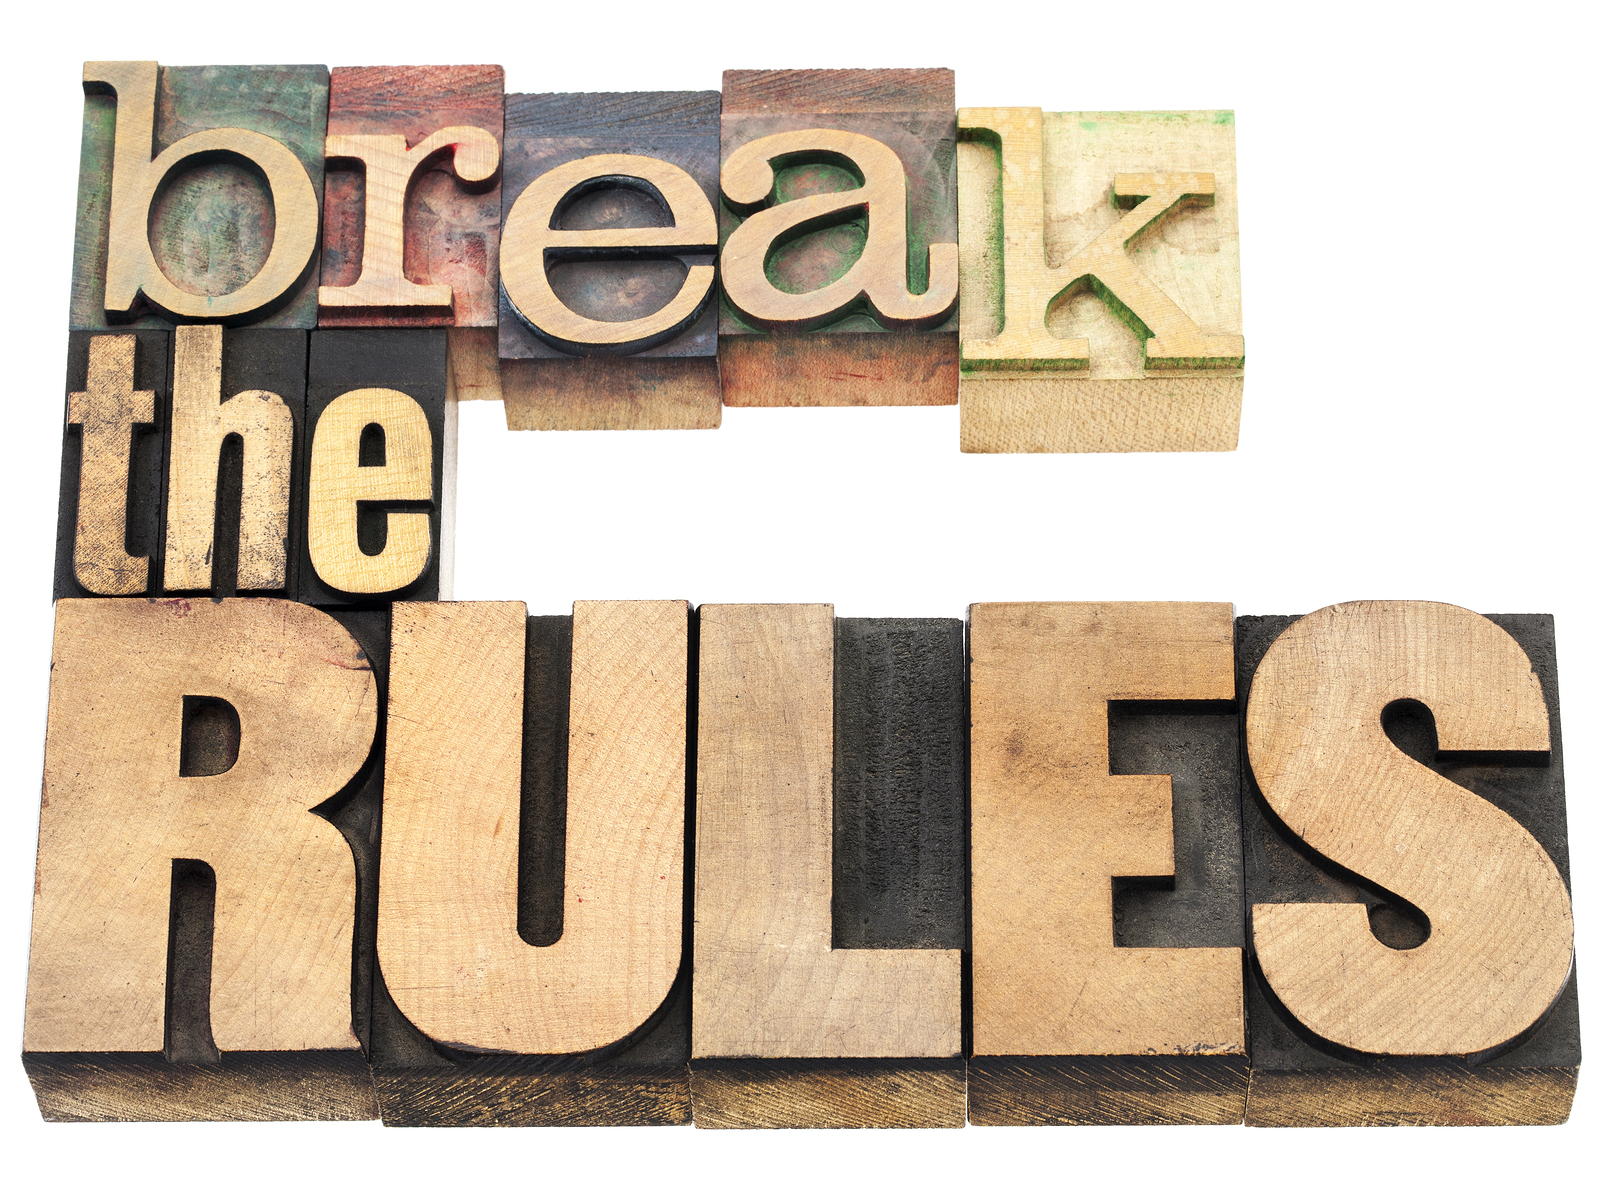 bigstock-break-the-rules--refuse-to-co-41889385.jpg